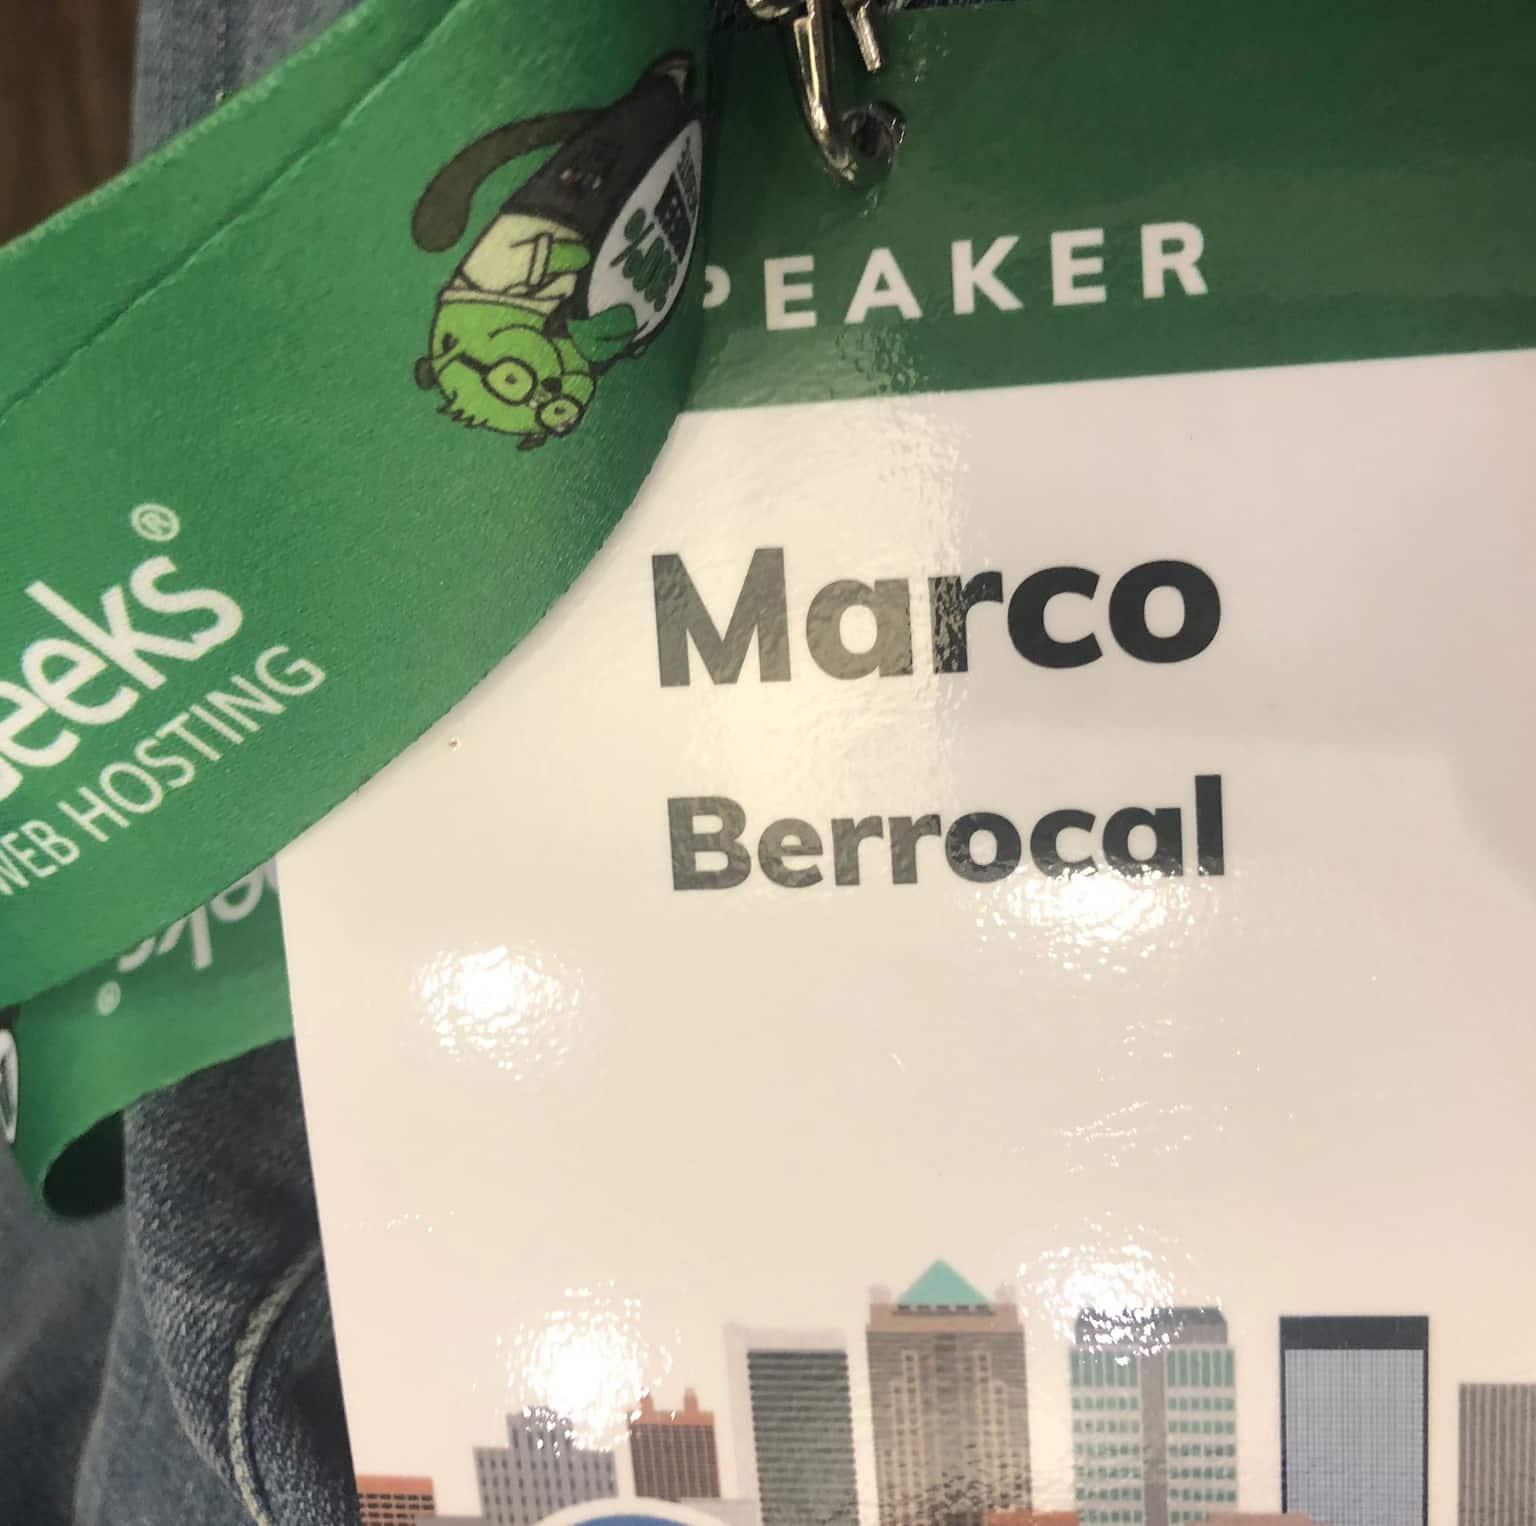 Speaker Marco Berrocal